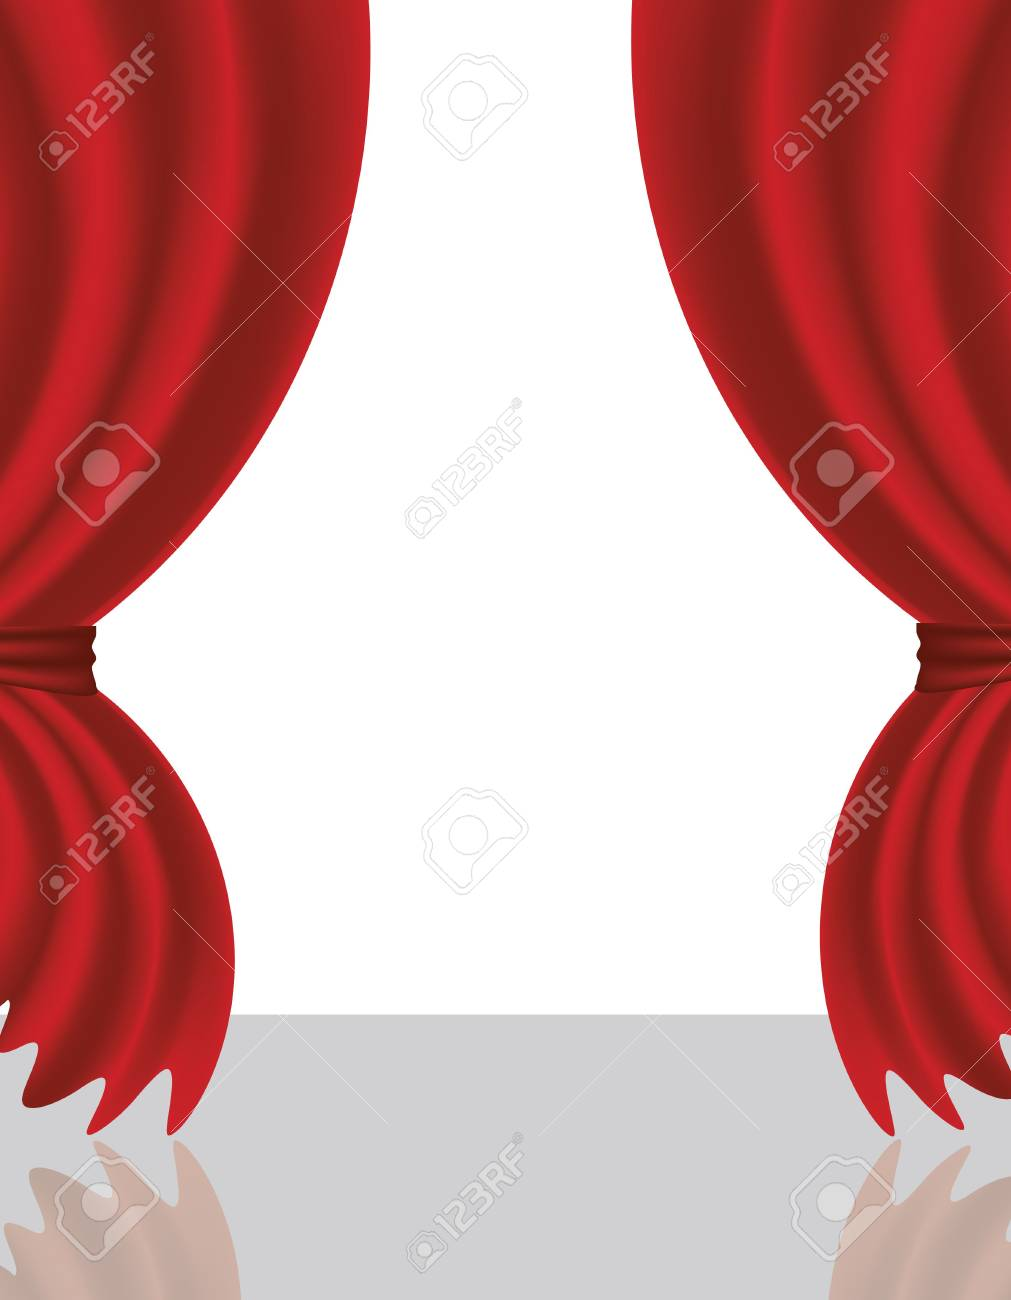 curtain Stock Photo - 3080776